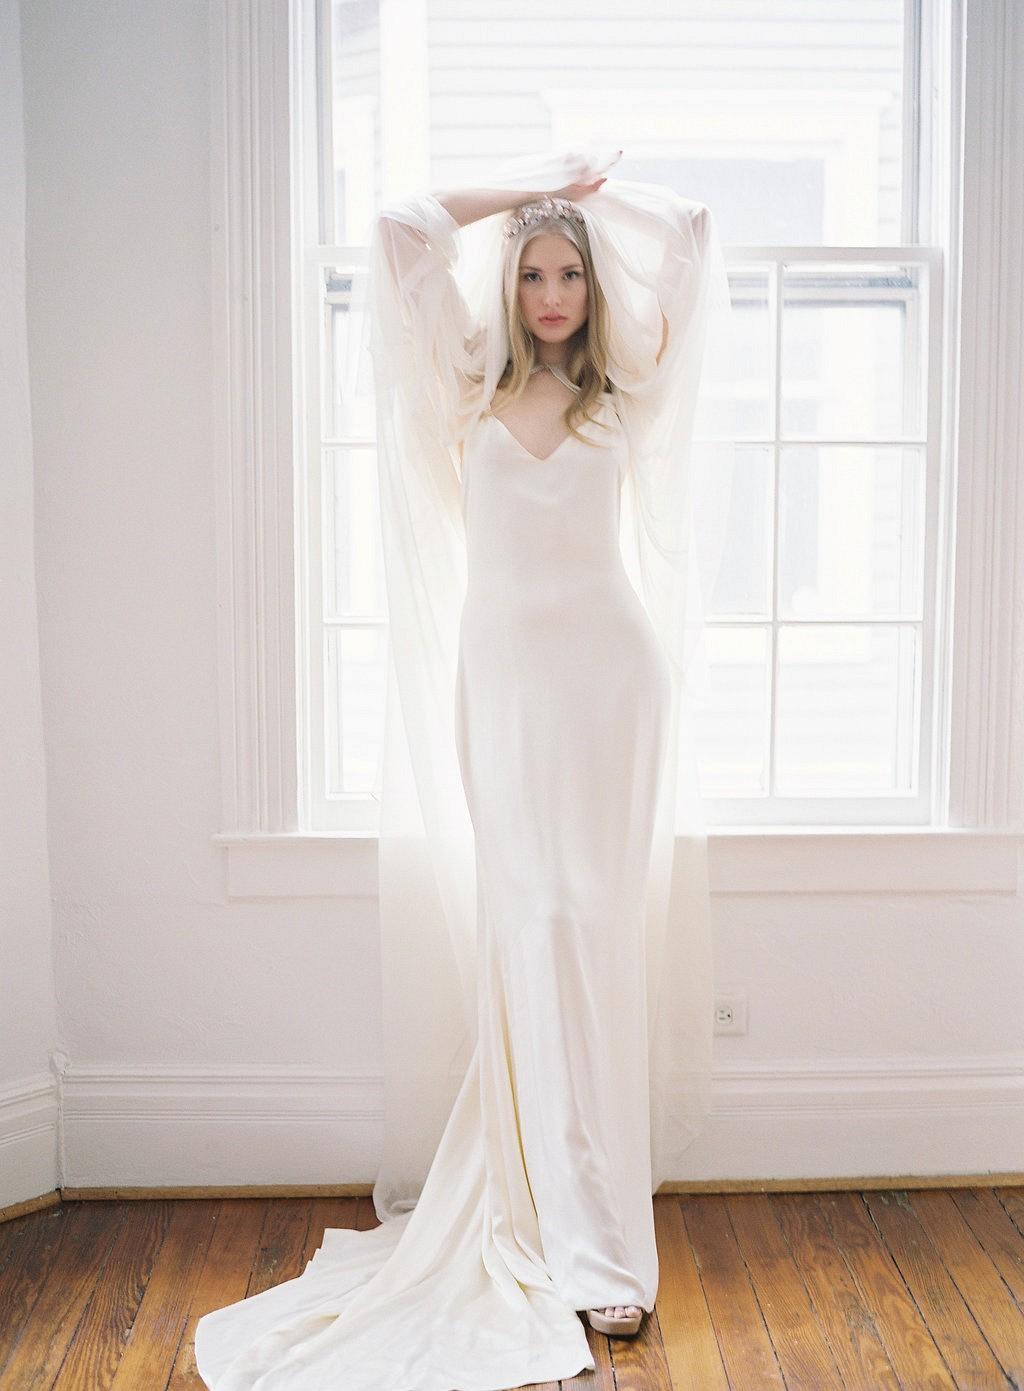 Choosing Your Wedding Dress Accessories